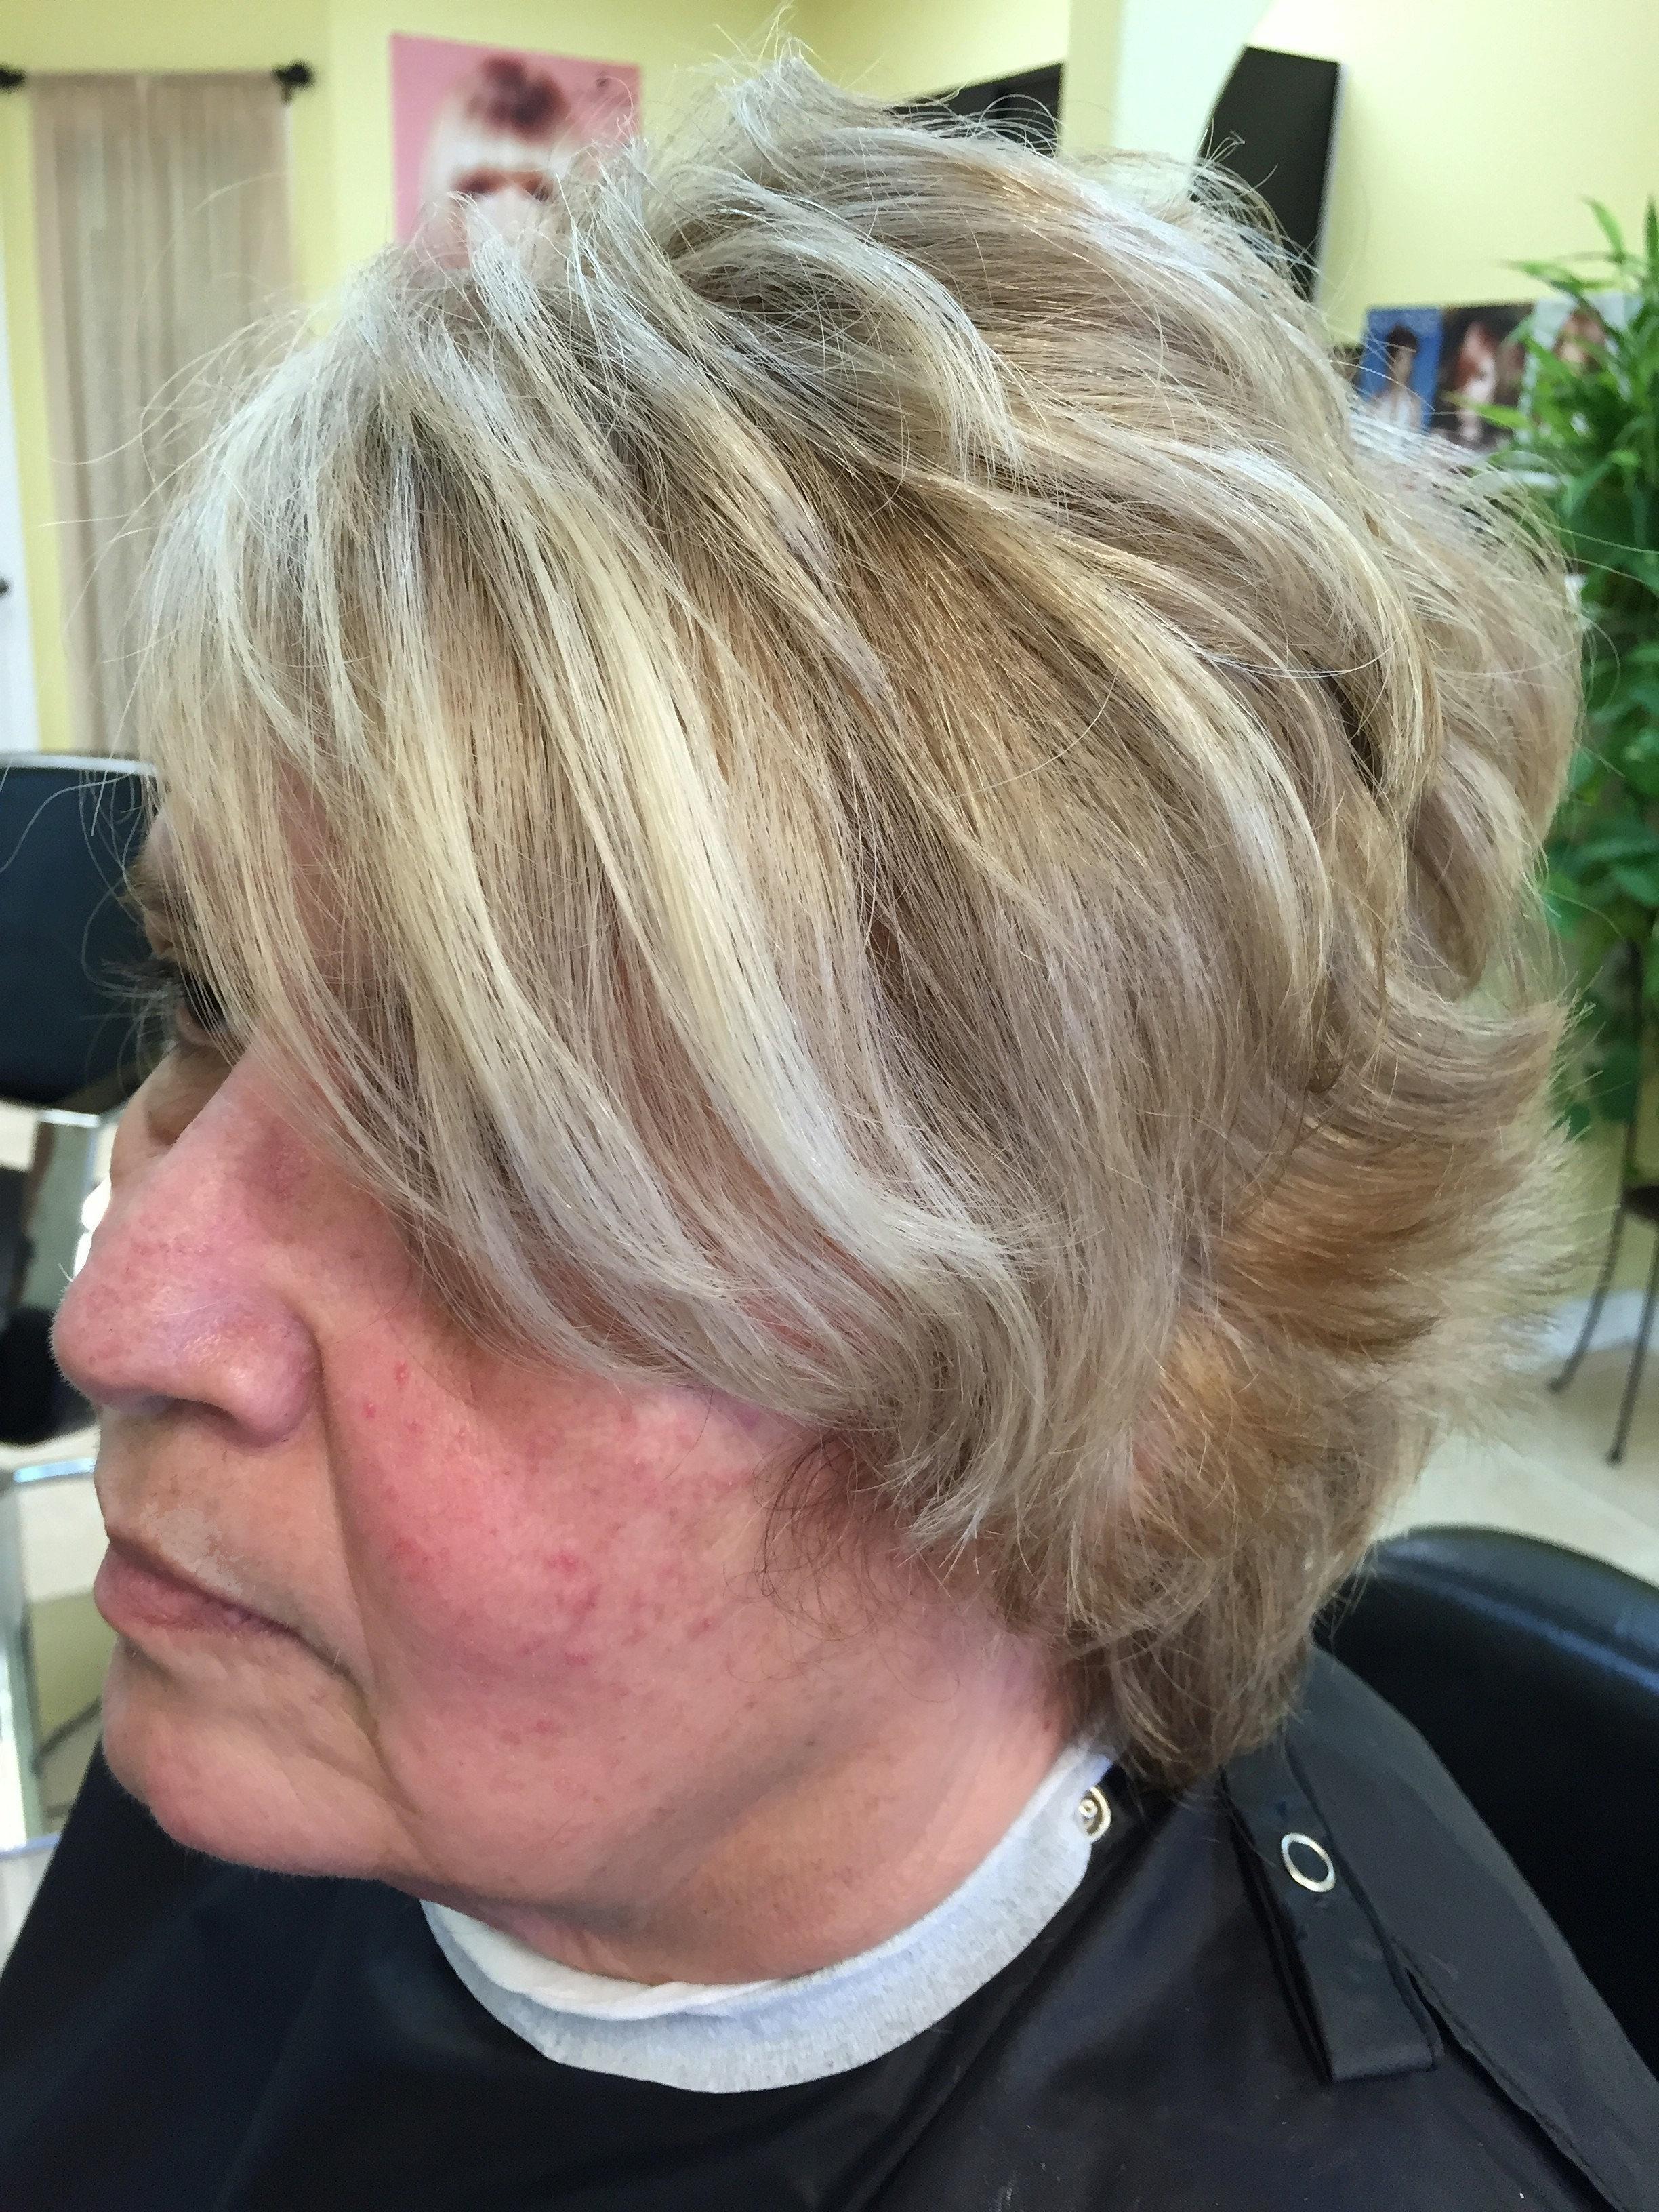 The Model Look Hair Salon Pearland Alvin Manvel Friendswood - The look hair salon